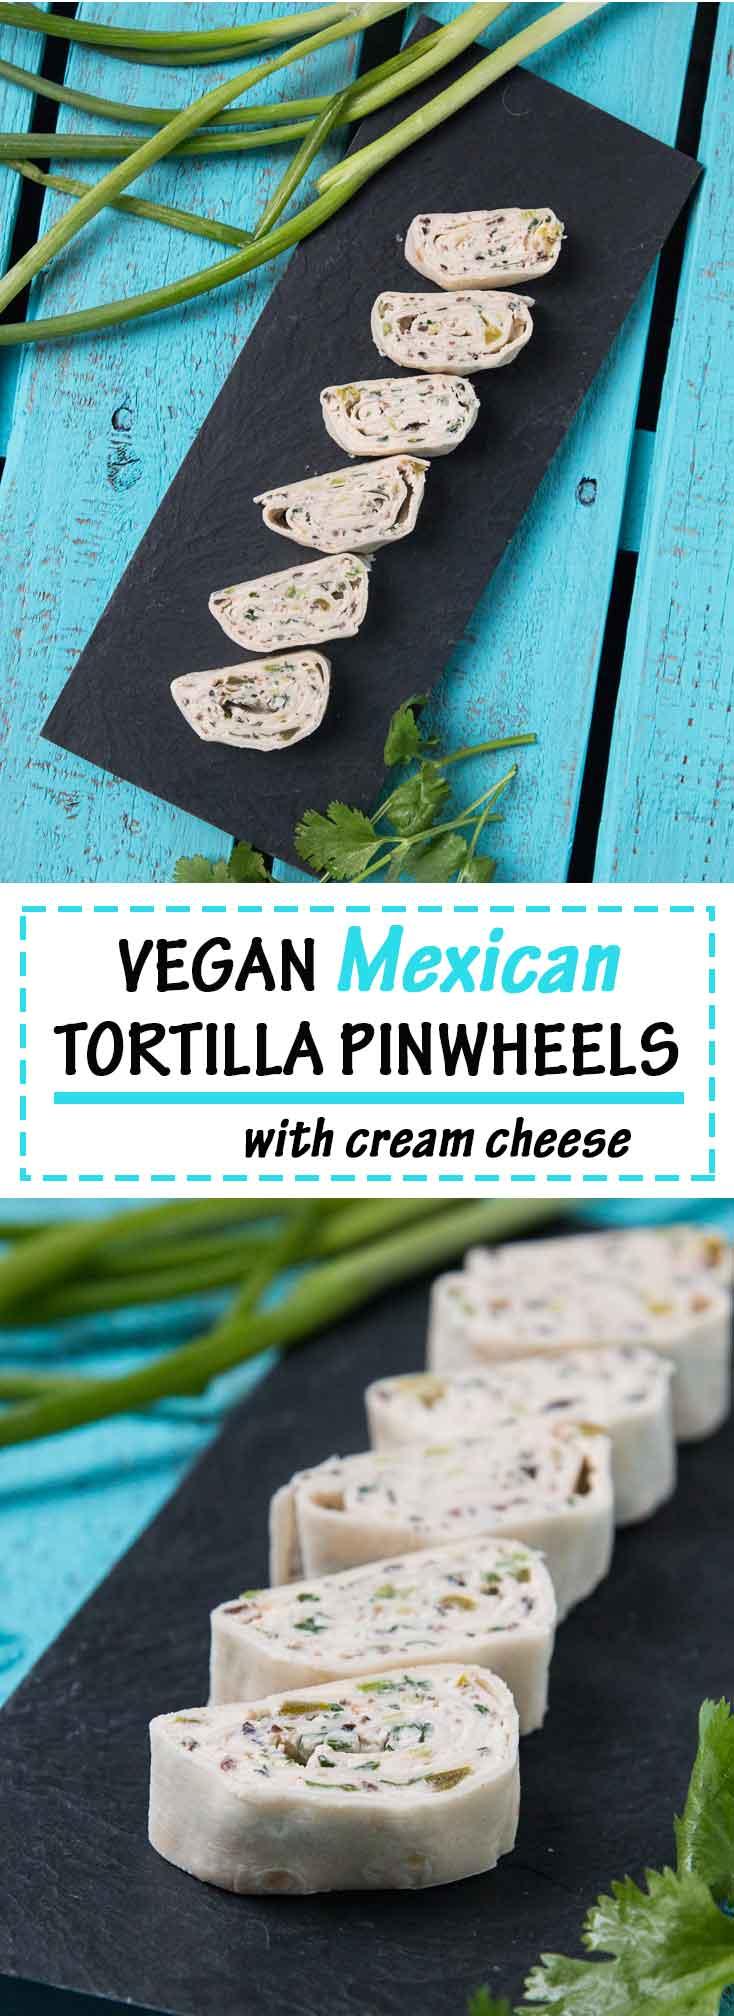 Mexican Tortilla Pinwheels (Vegan) #vegan | Vegetarian Gastronomy | www.VegetarianGastronomy.com